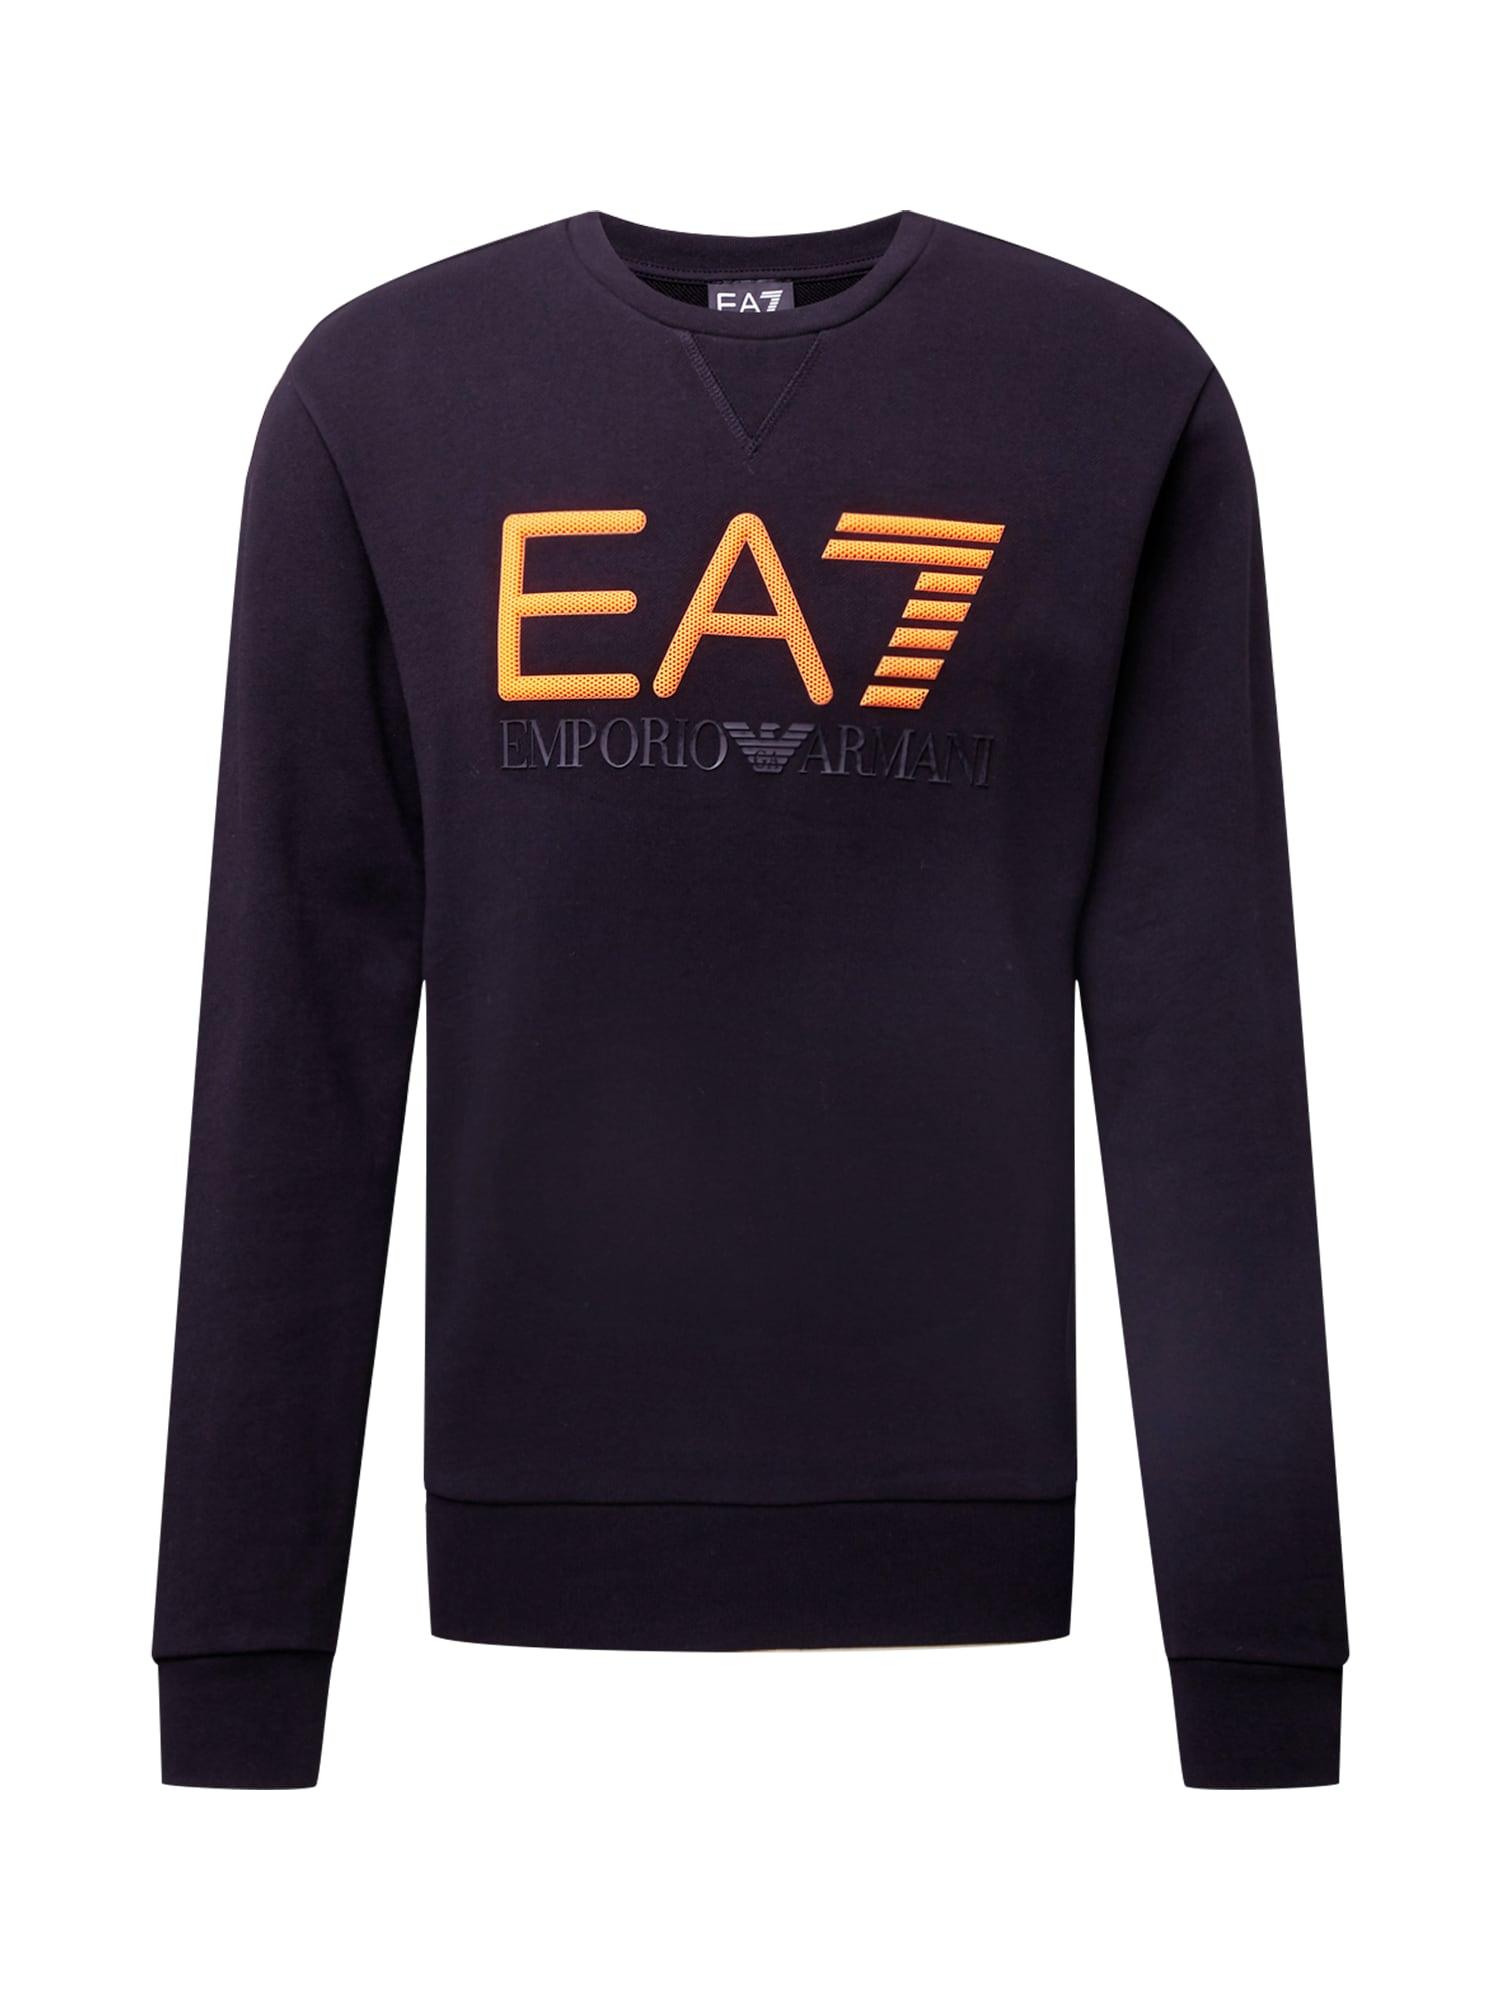 EA7 Emporio Armani Megztinis be užsegimo